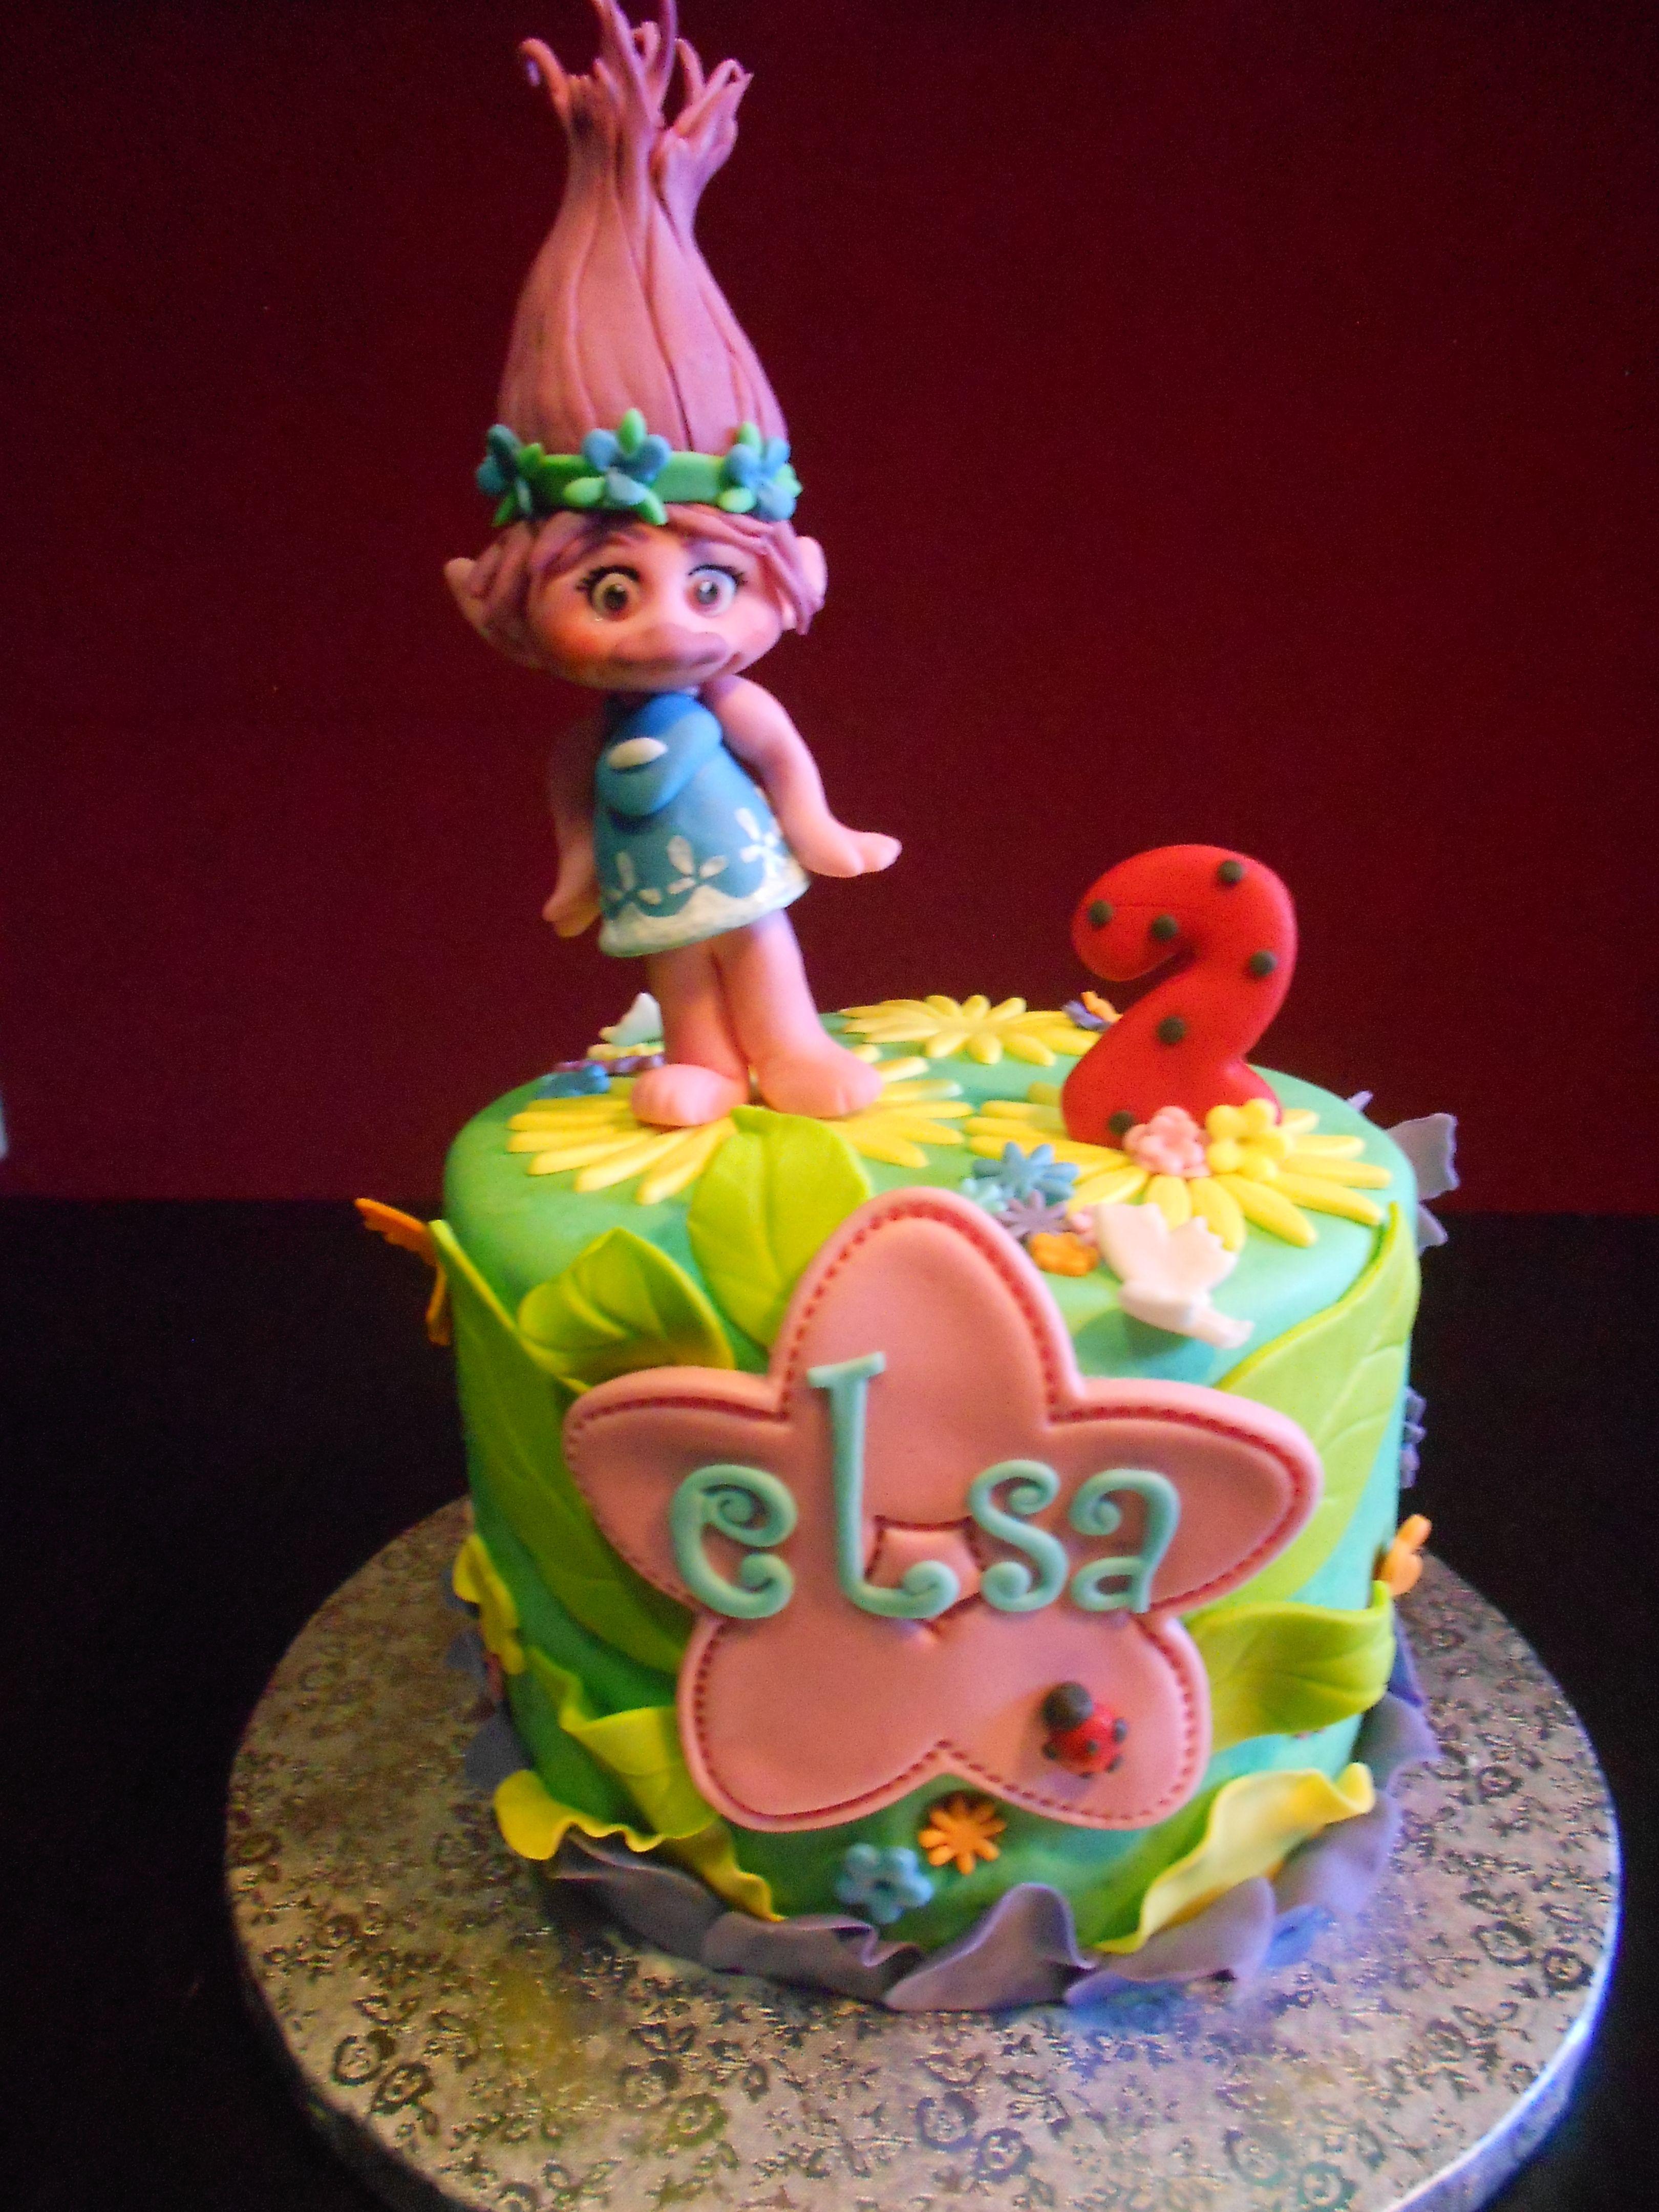 Tarta Princesa Poppy de Troll Fondant Ms fotos en el link